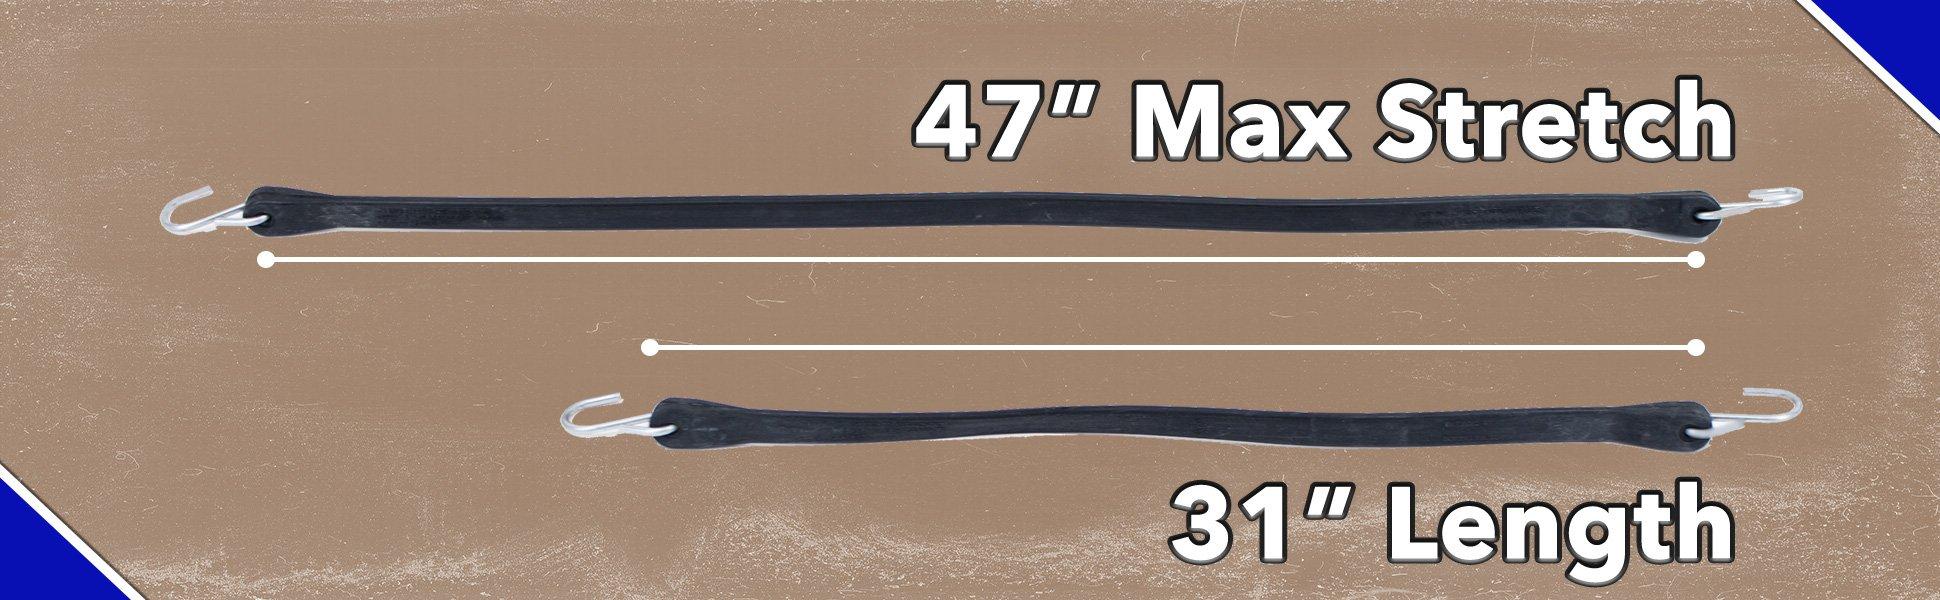 Max Length